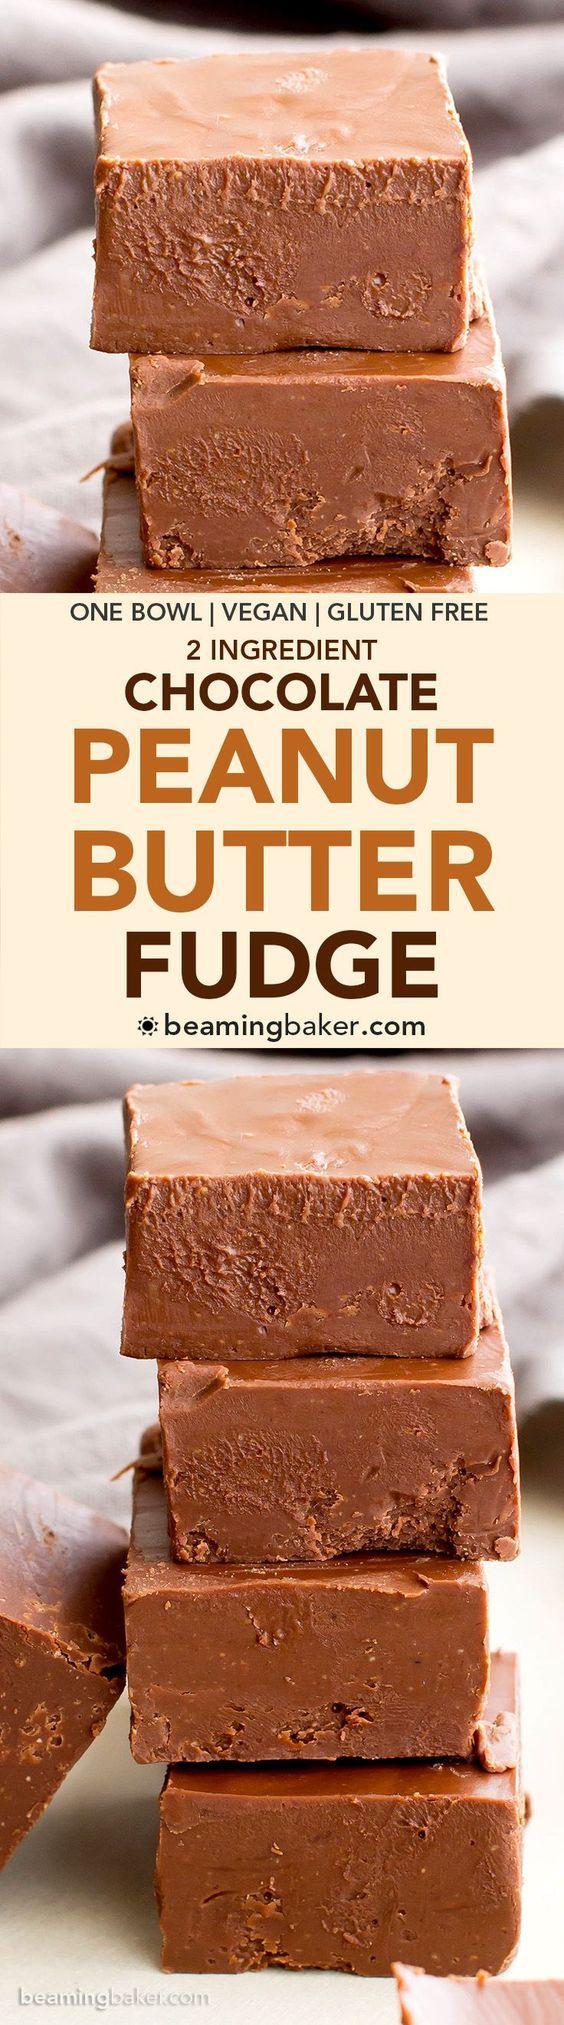 2 Ingredient Vegan Chocolate Peanut Butter Freezer Fudge (V, GF, DF): a super easy recipe for thick, decadent chocolate peanut butter fudge. #Vegan #GlutenFree #DairyFree | http://BeamingBaker.com